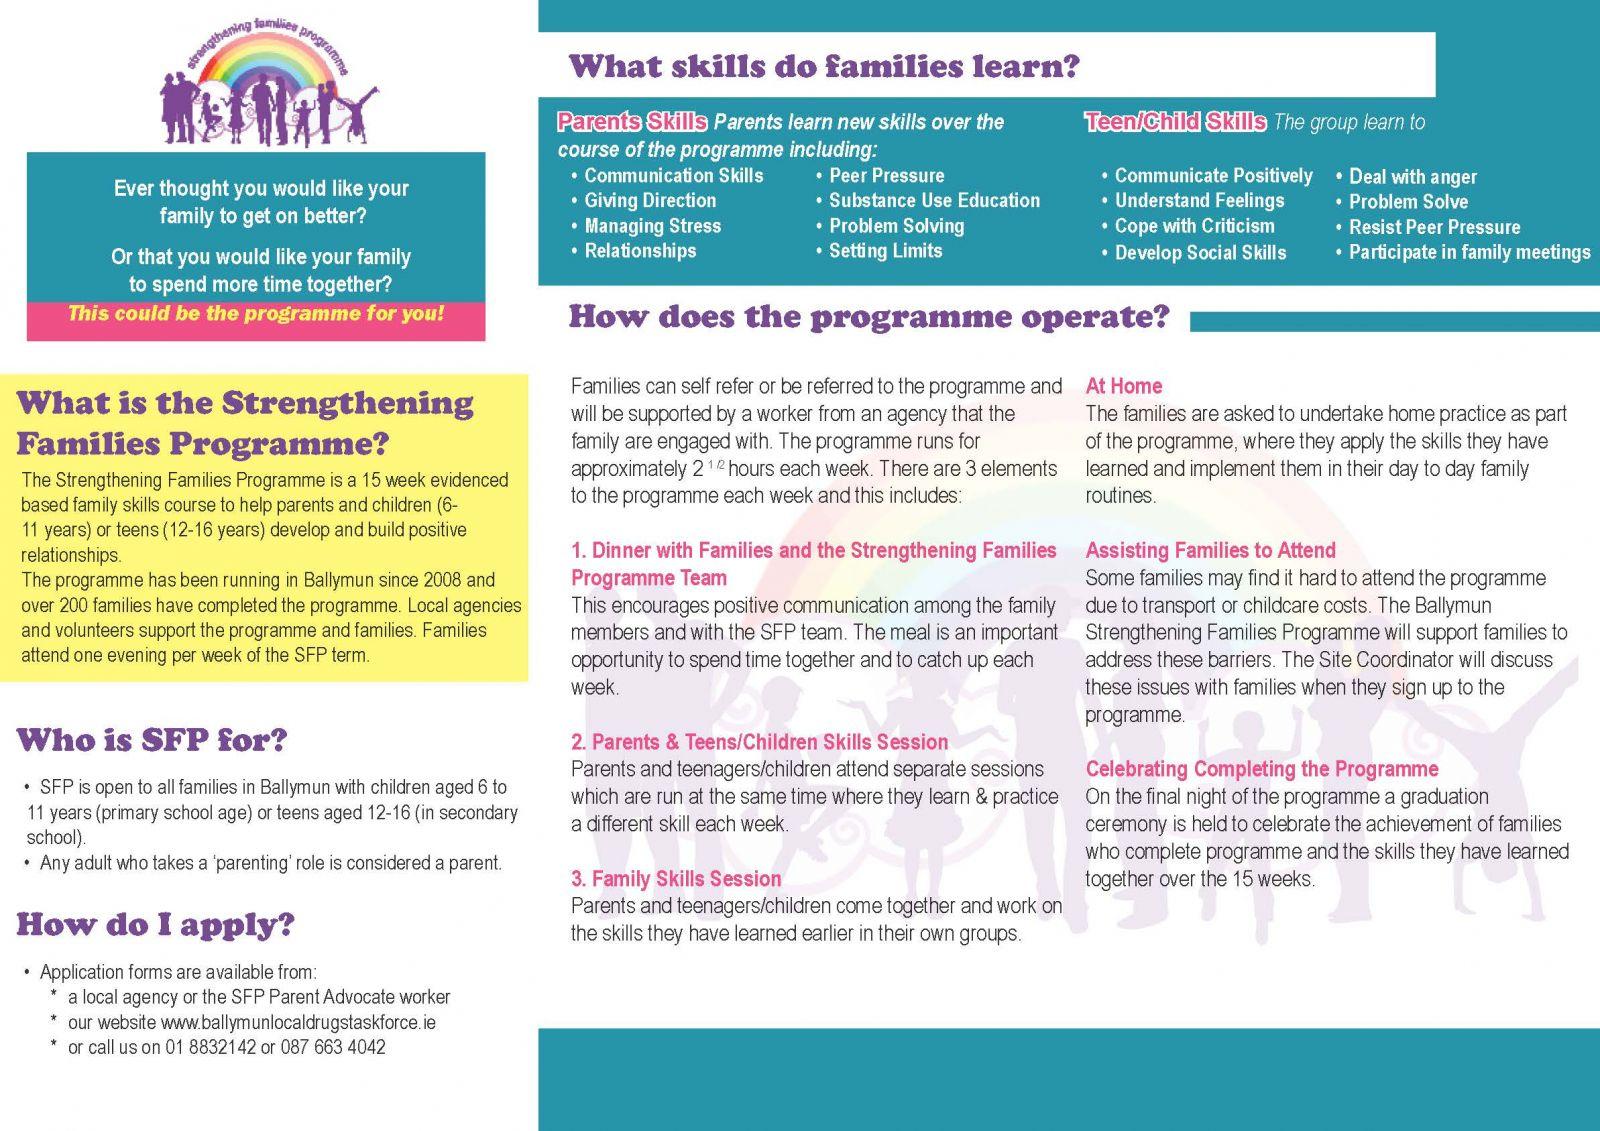 Strengthening Families Programme | Ballymun Local Drugs Task Force